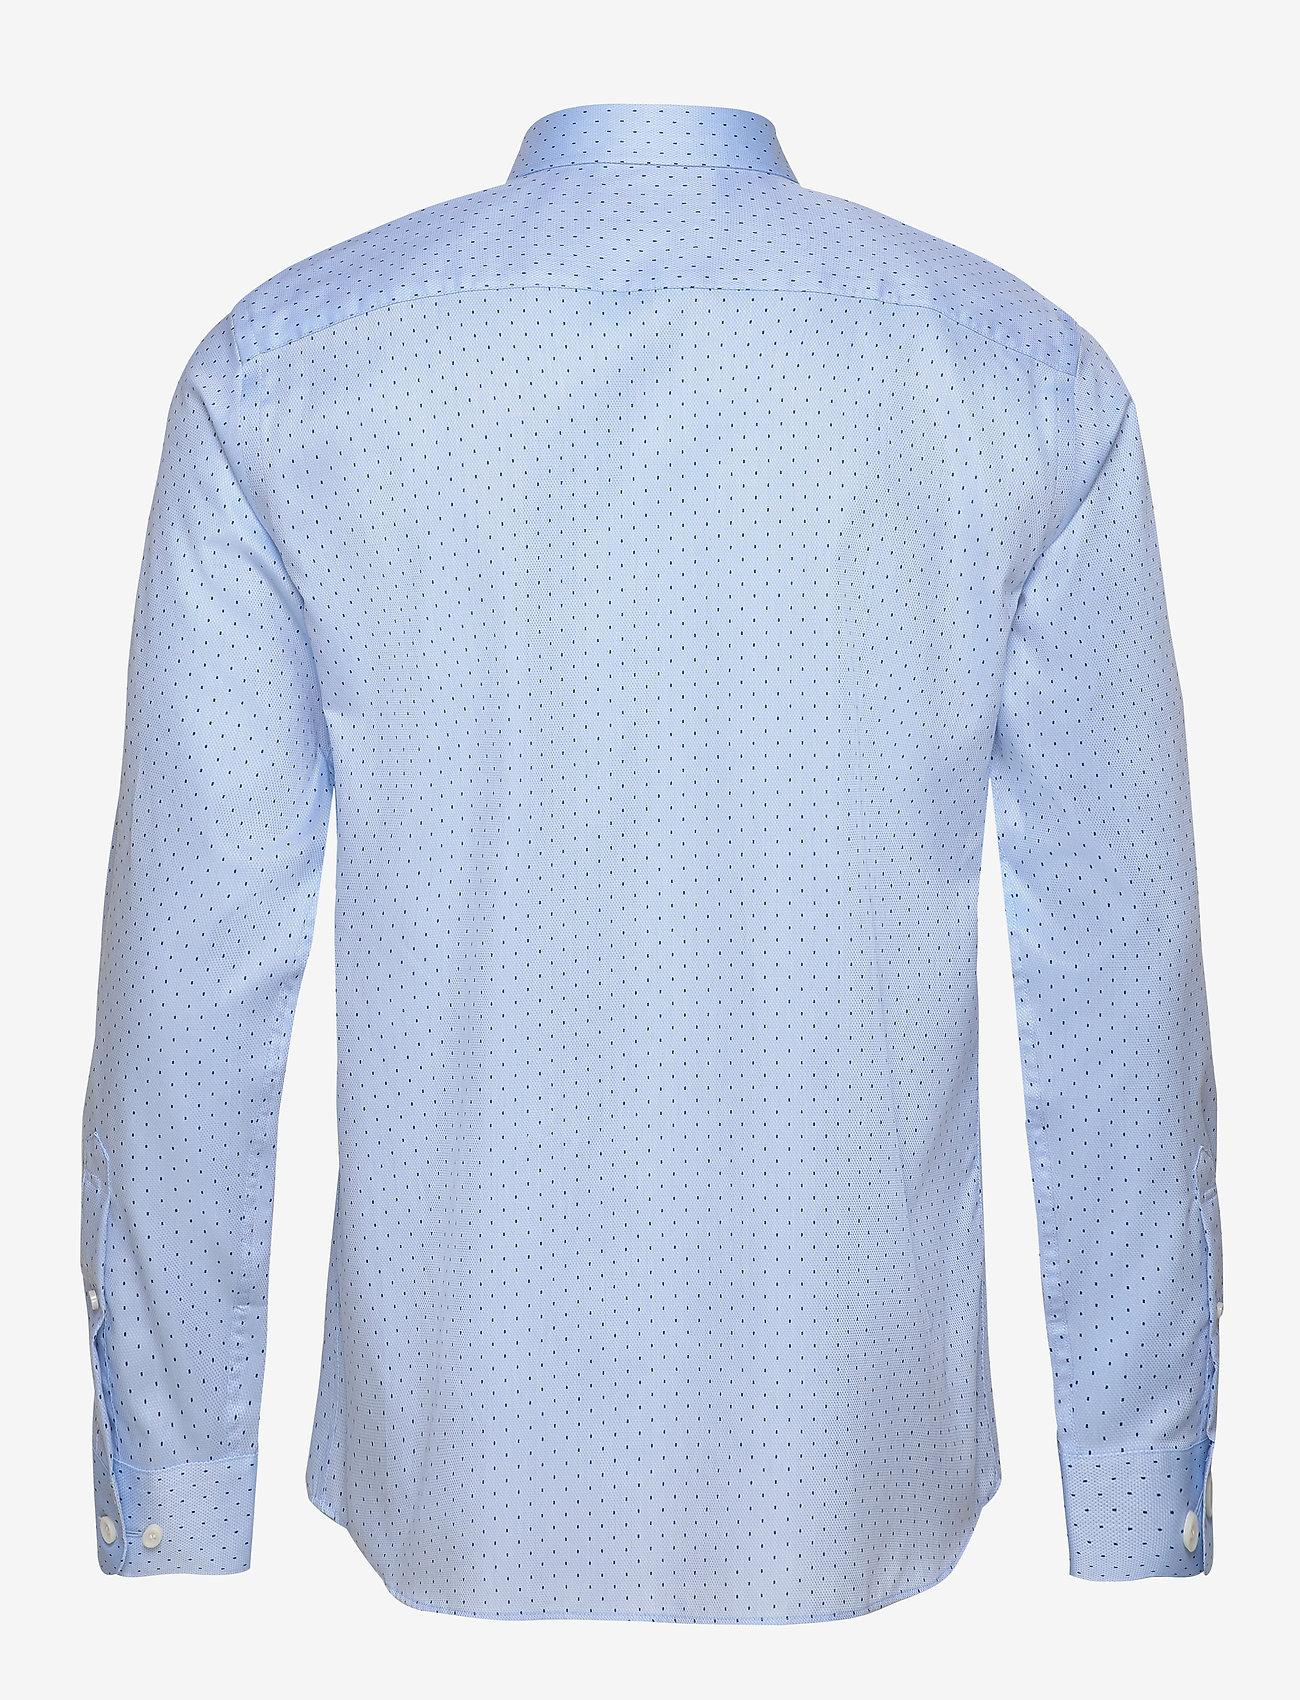 Selected Homme - SLHREGPEN-KENO SHIRT LS B NOOS - chemises business - light blue